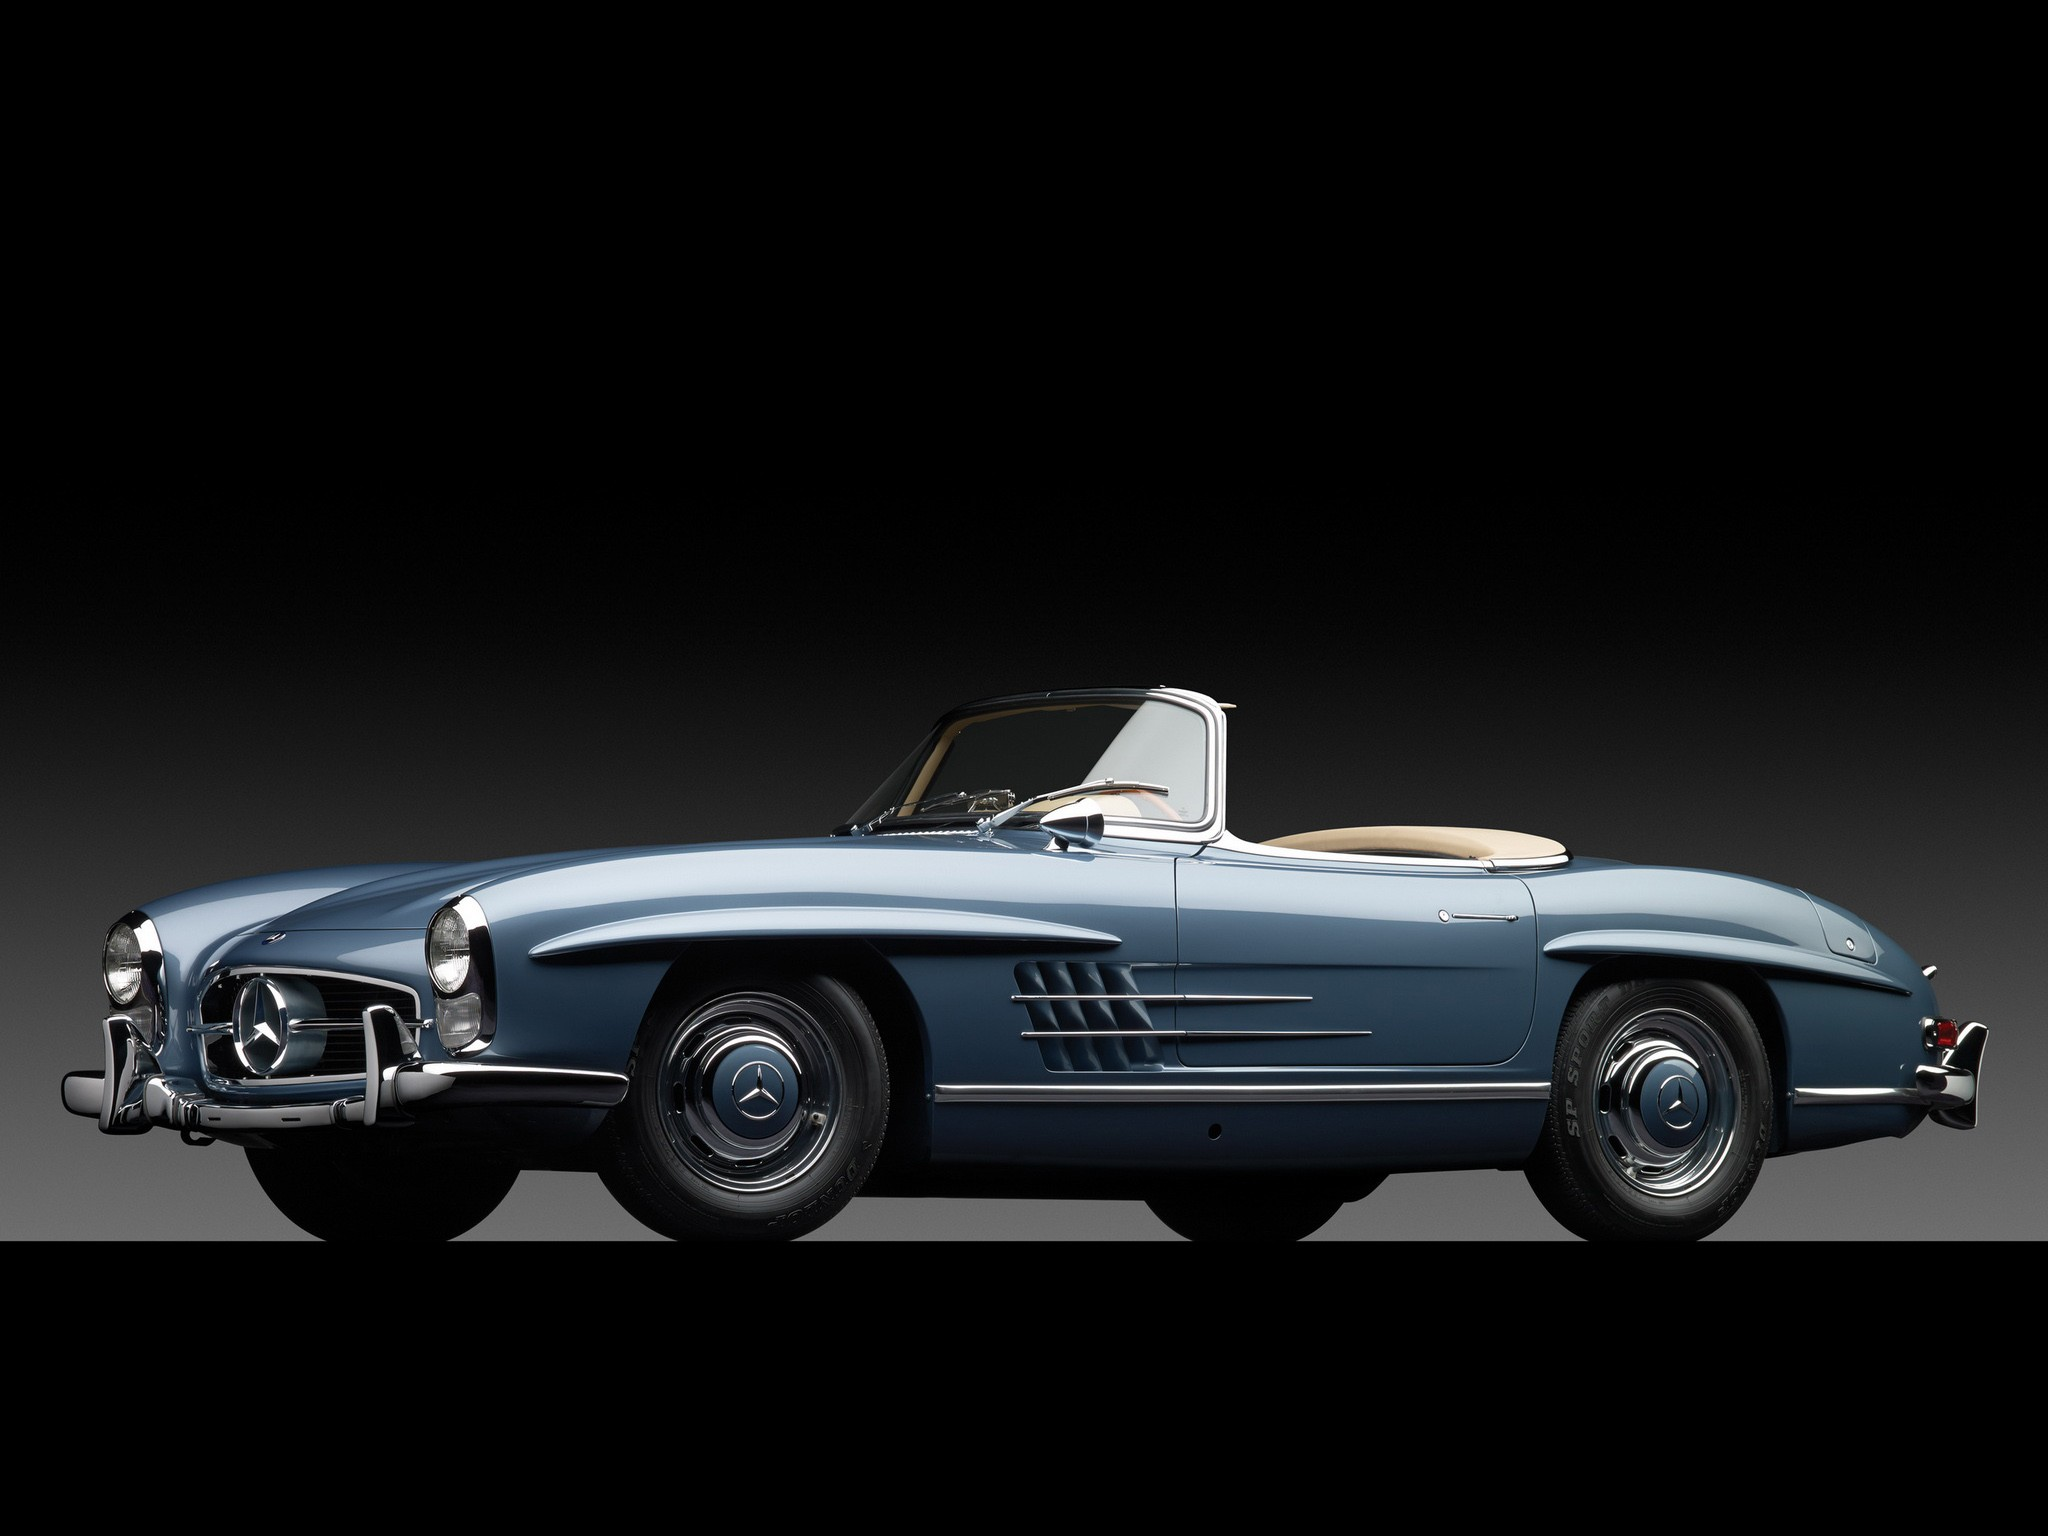 Mercedes benz 300 sl roadster w198 1957 1958 1959 for Mercedes benz sl 300